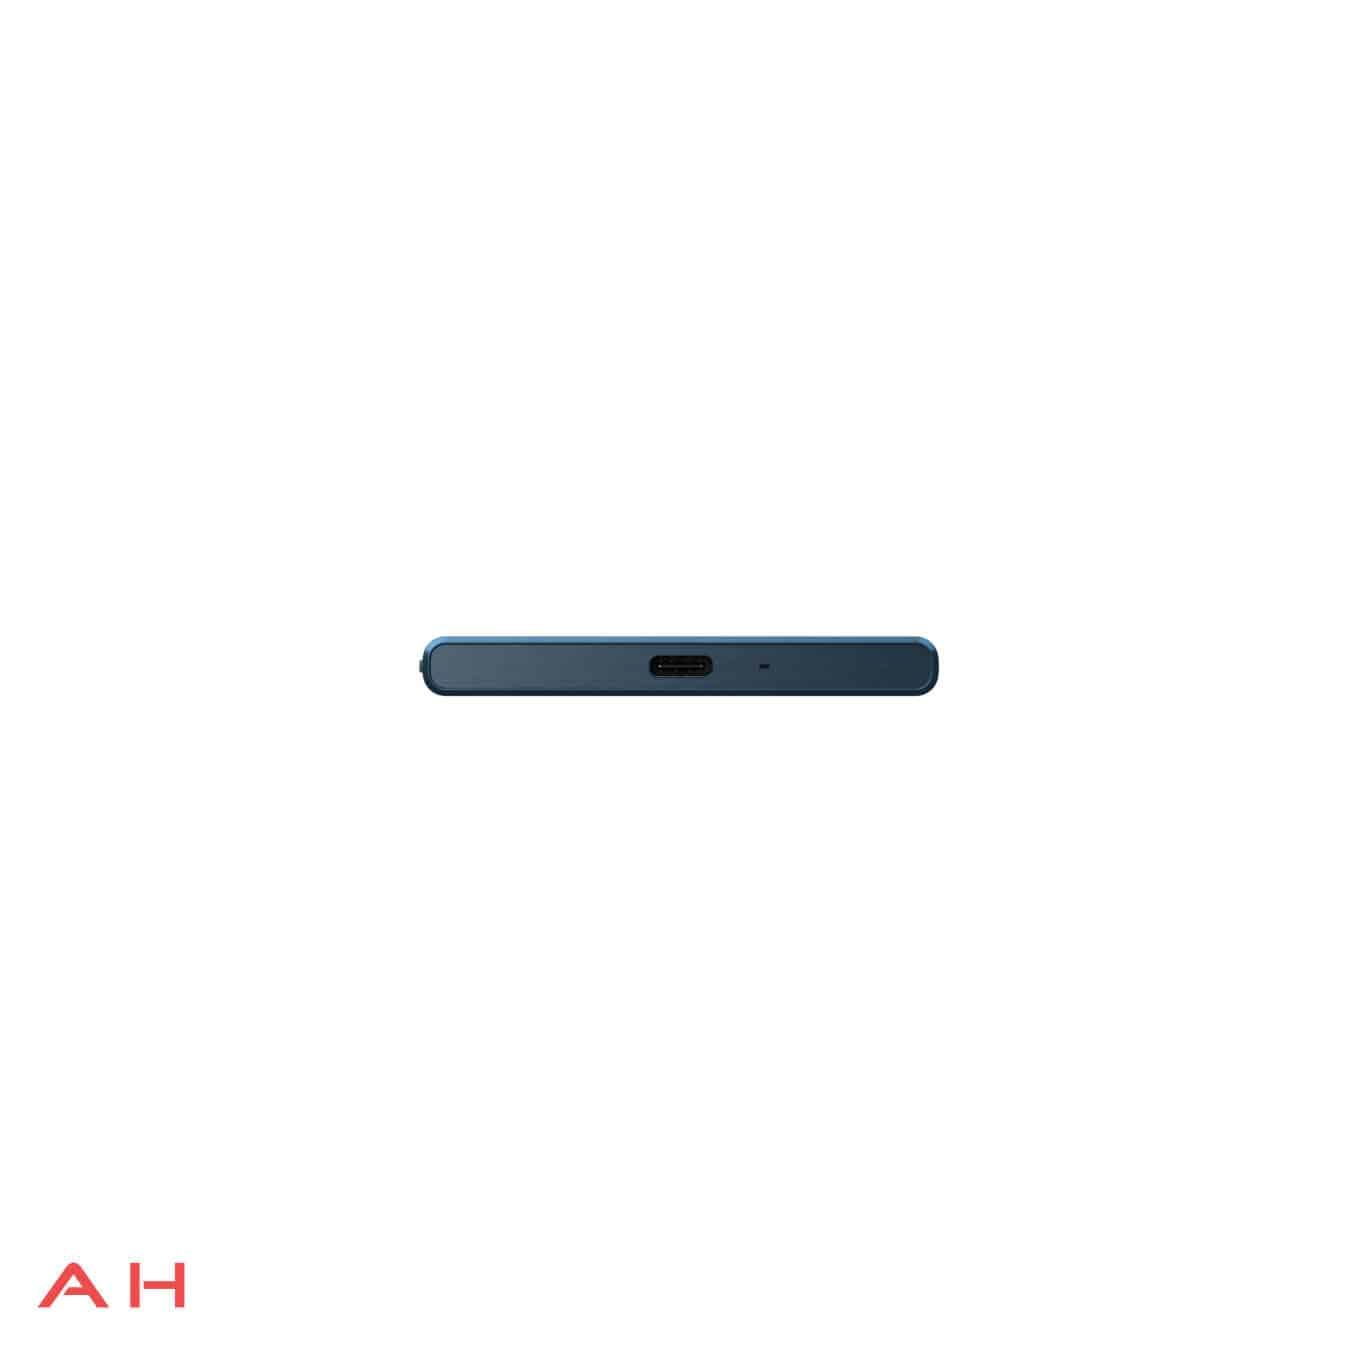 Sony Xperia XZ AH 10